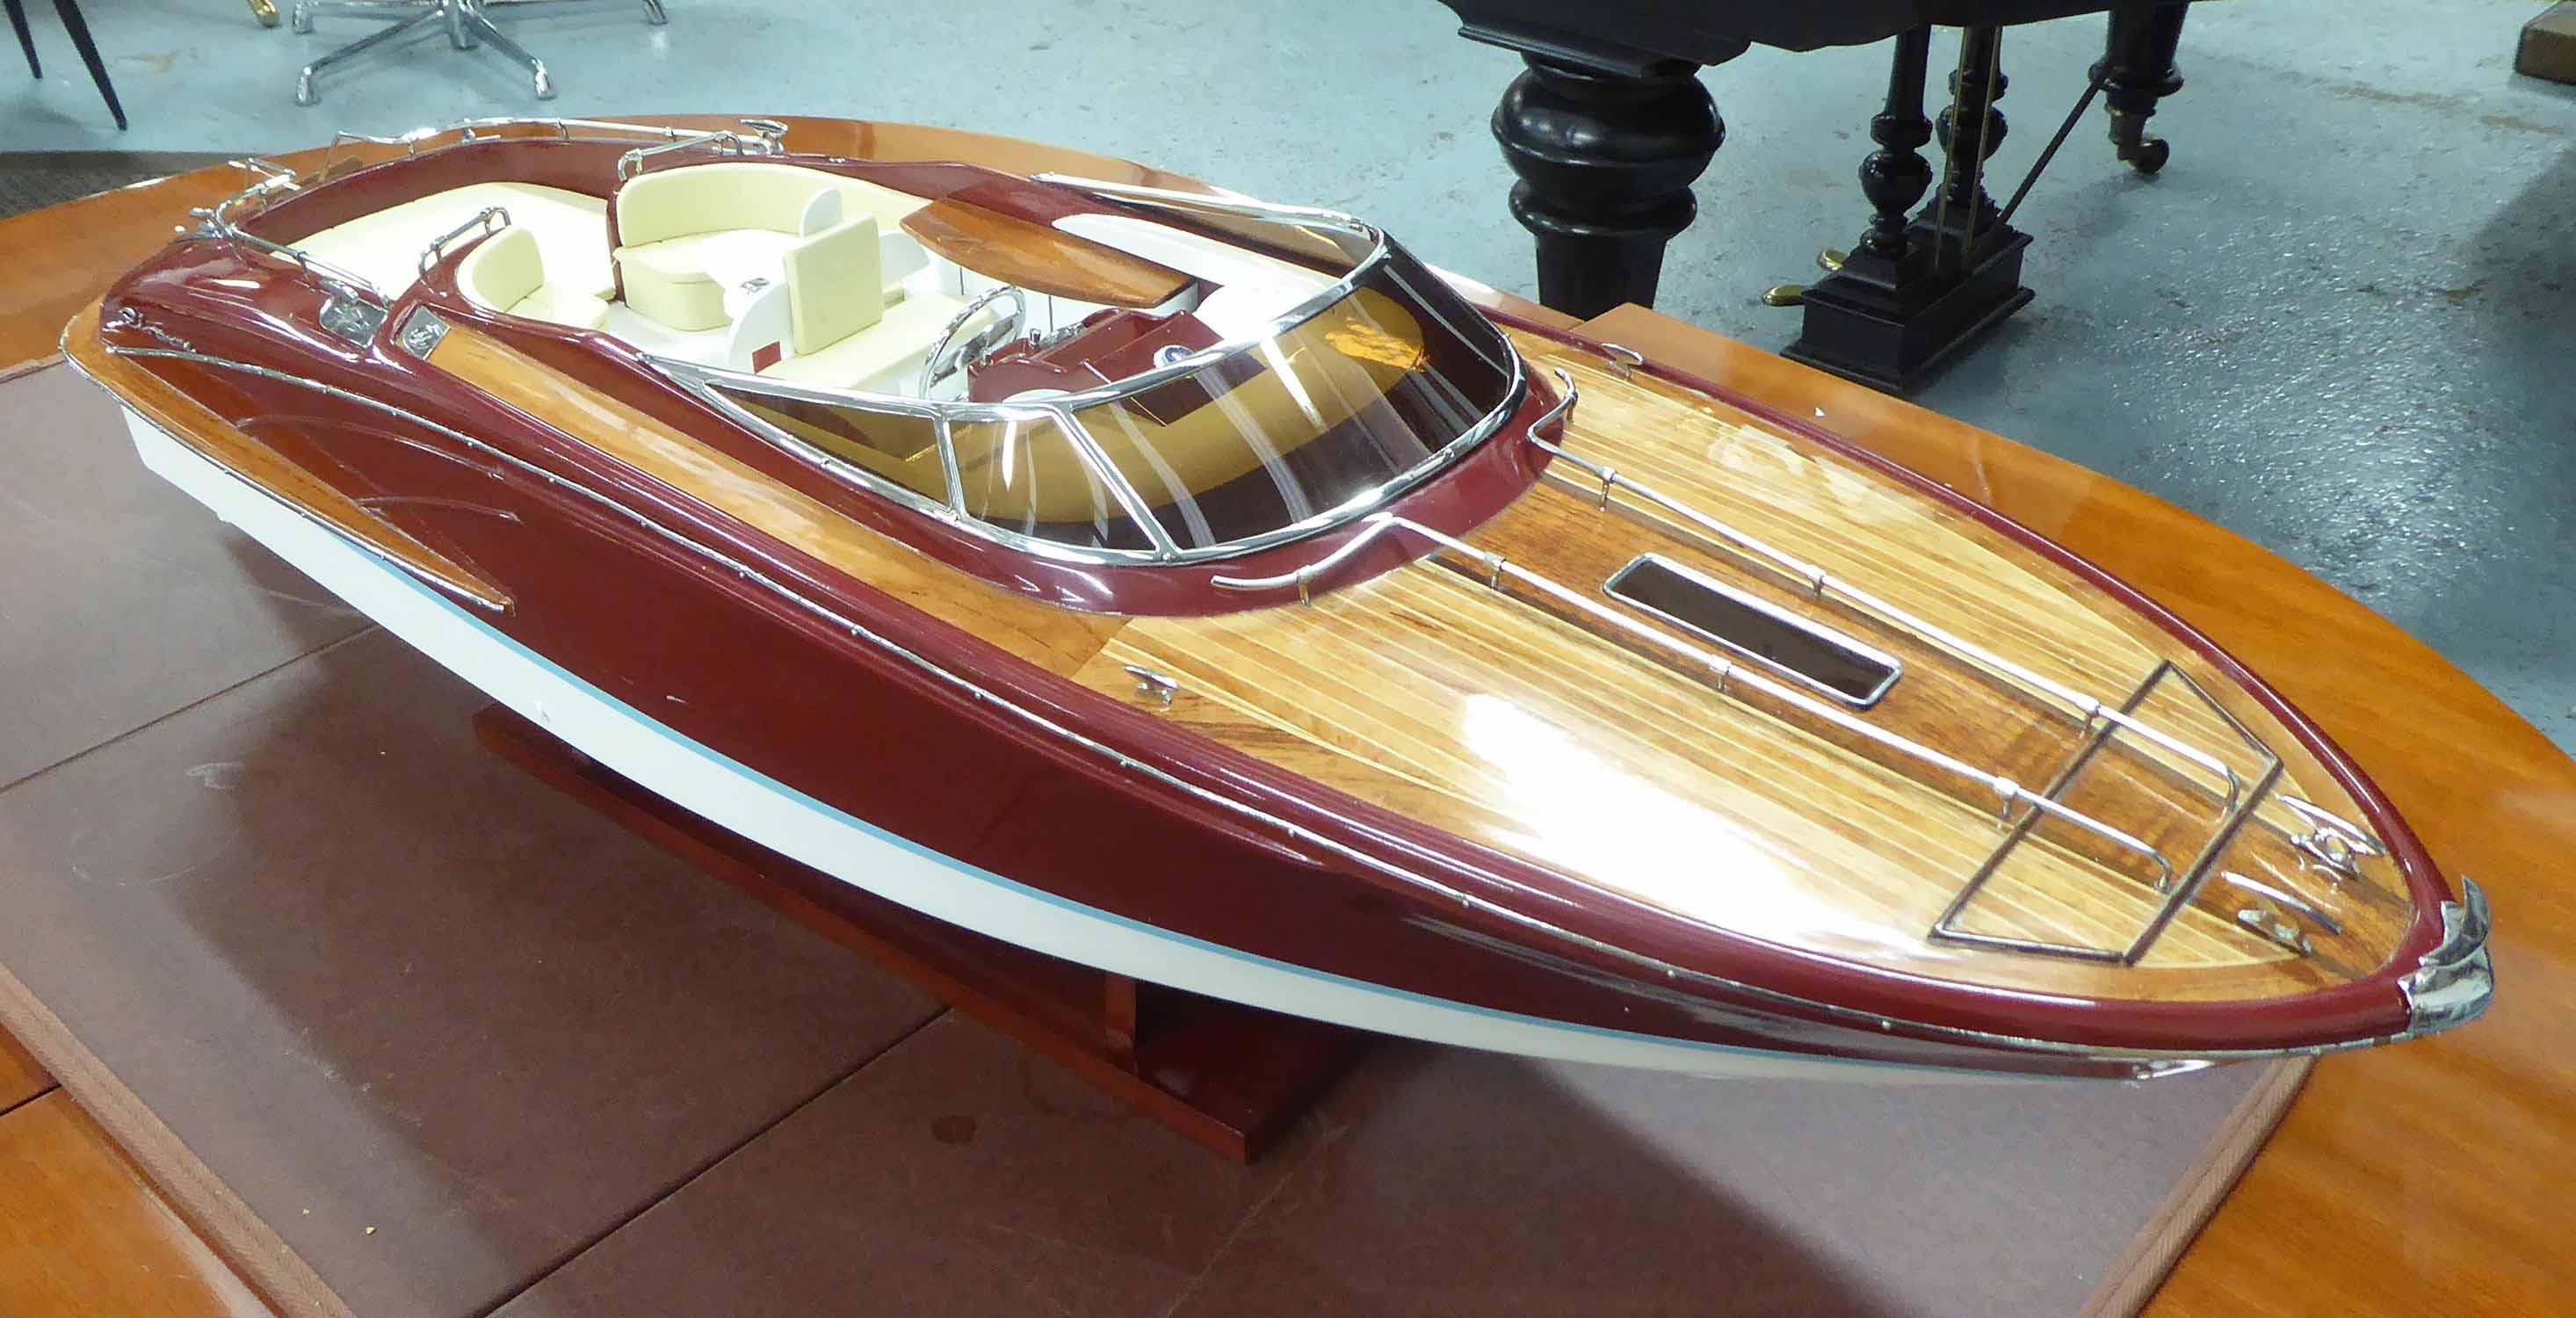 Lot 118 - CLASSIC RIVARAMA MODEL BOAT, lacquer finish, with stand, 90cm L.